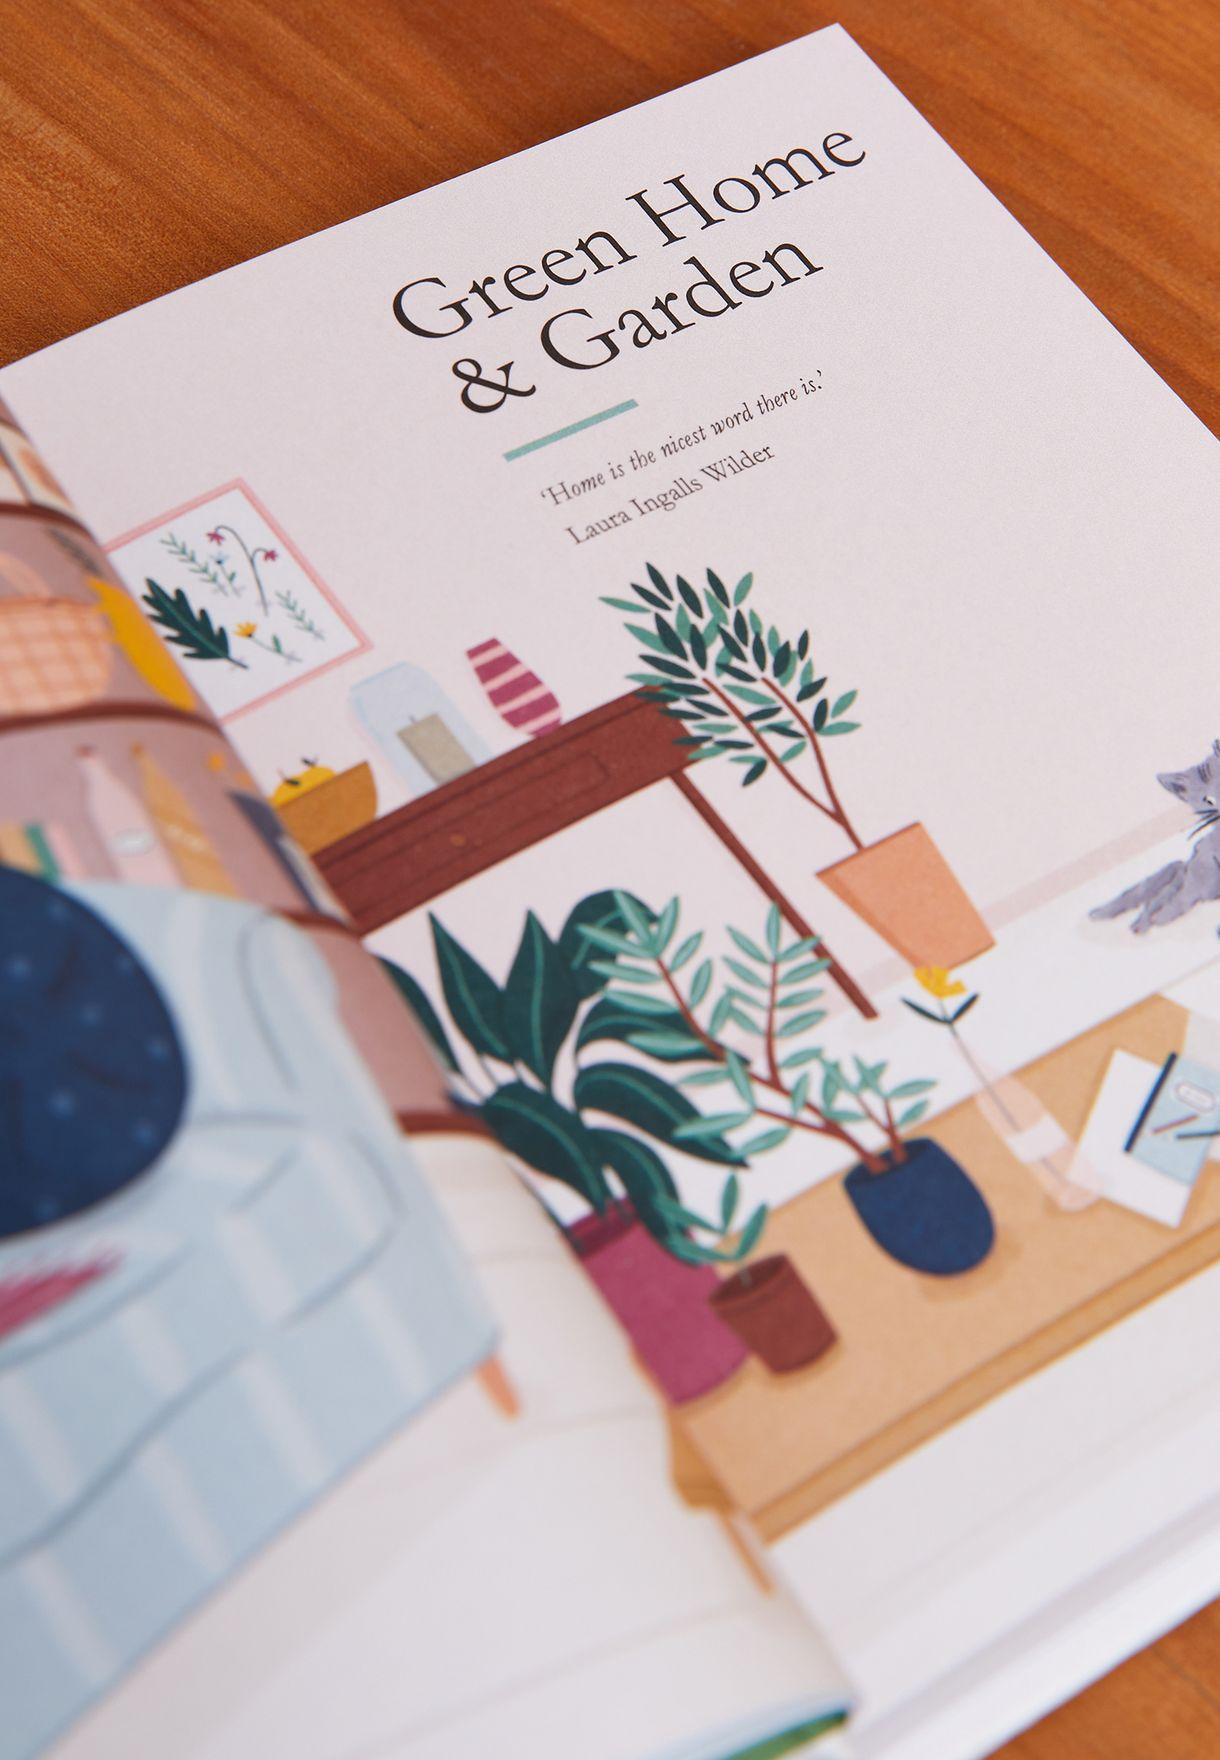 كتاب ليف جرين (Live Green)